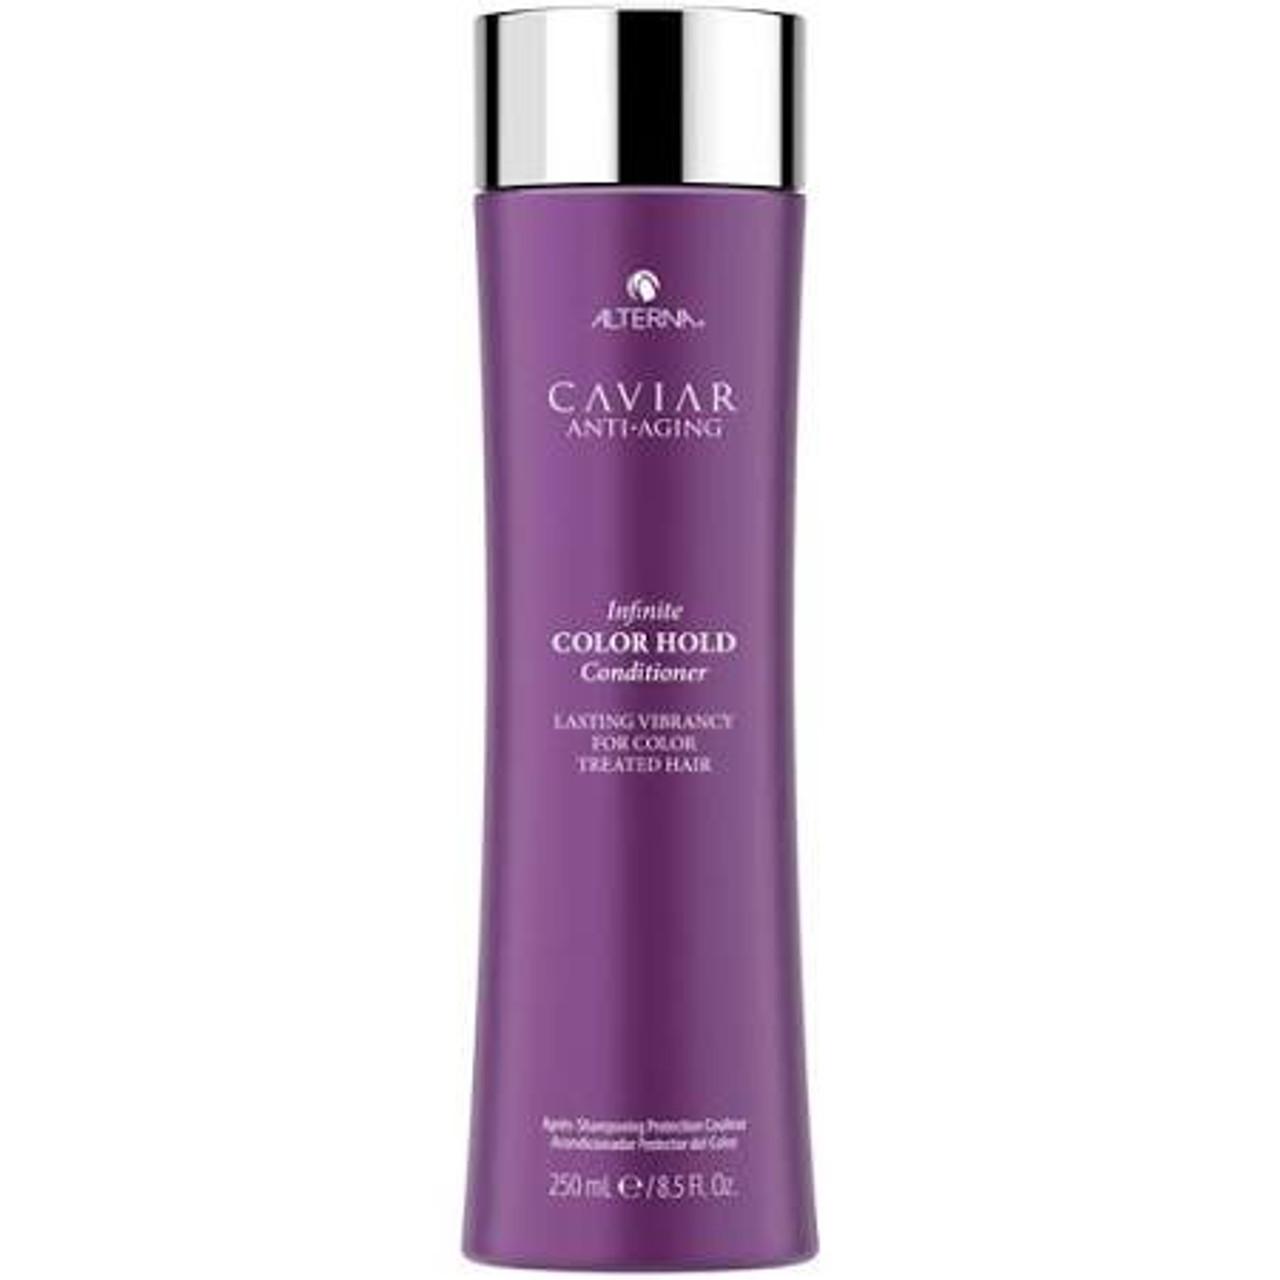 Alterna Caviar Infinite Color Hold Conditioner 8.5 oz